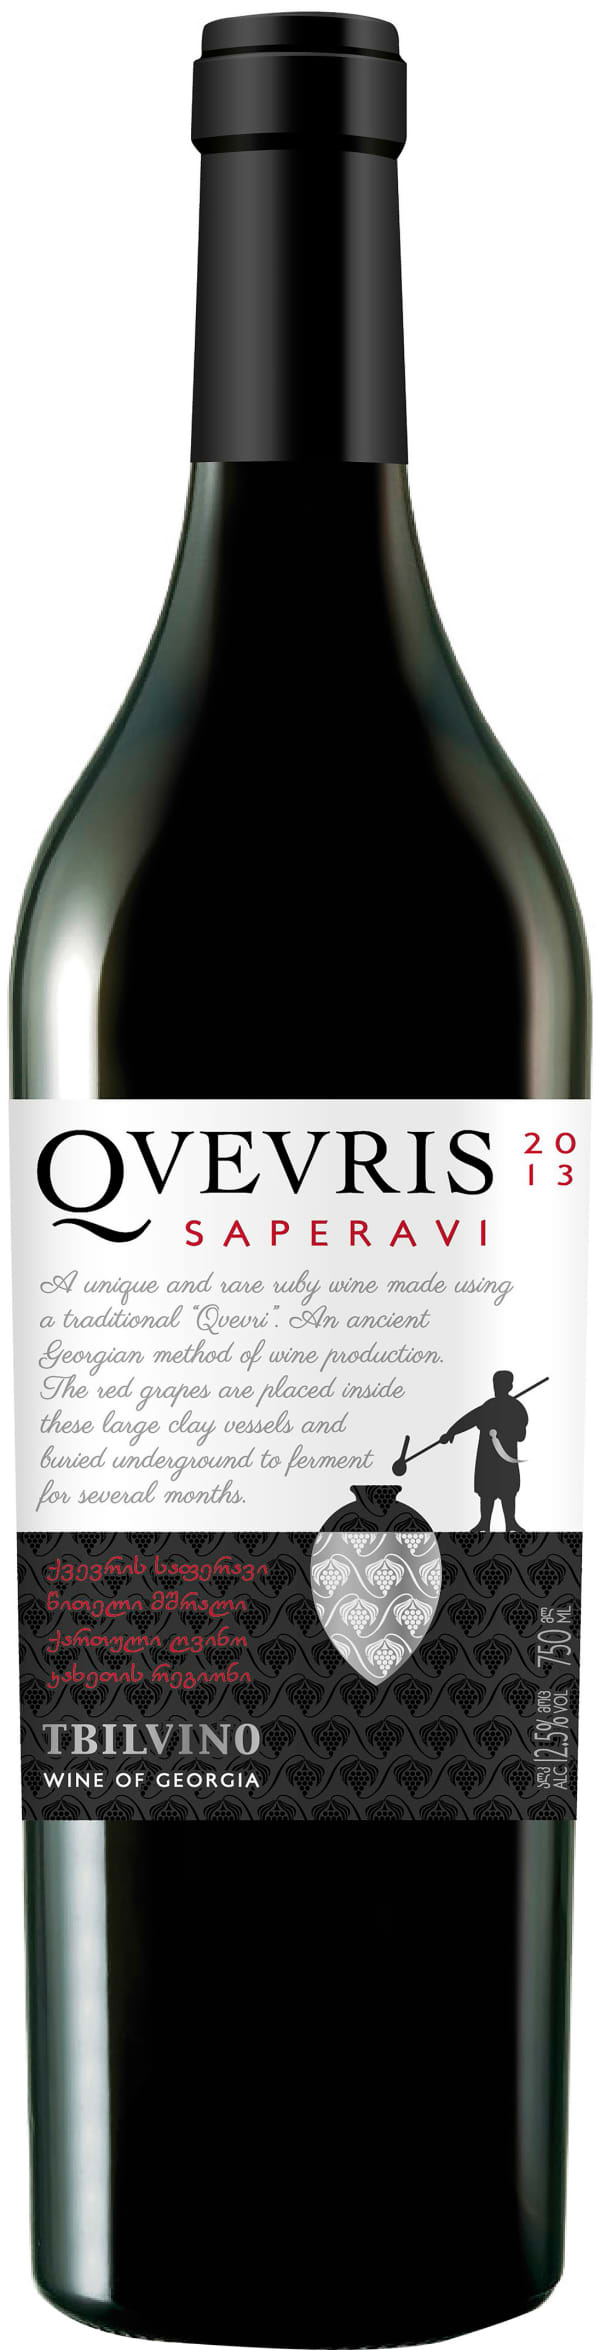 Qvevris Saperavi 2016